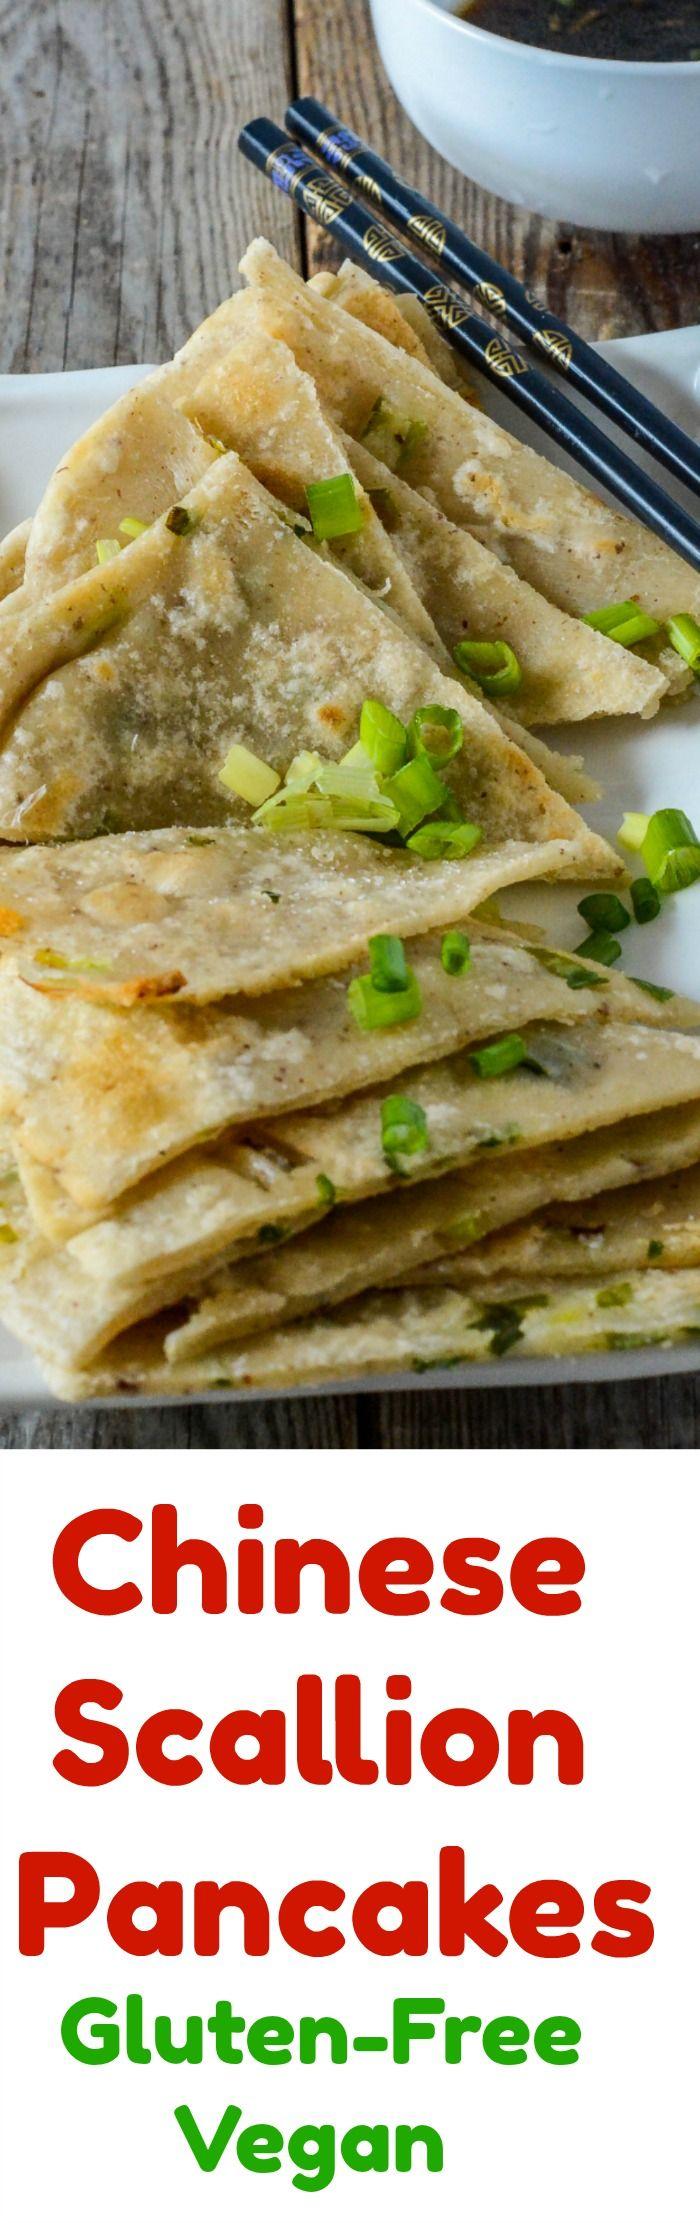 Chinese Scallion Pancakes Gluten-Free, Vegan